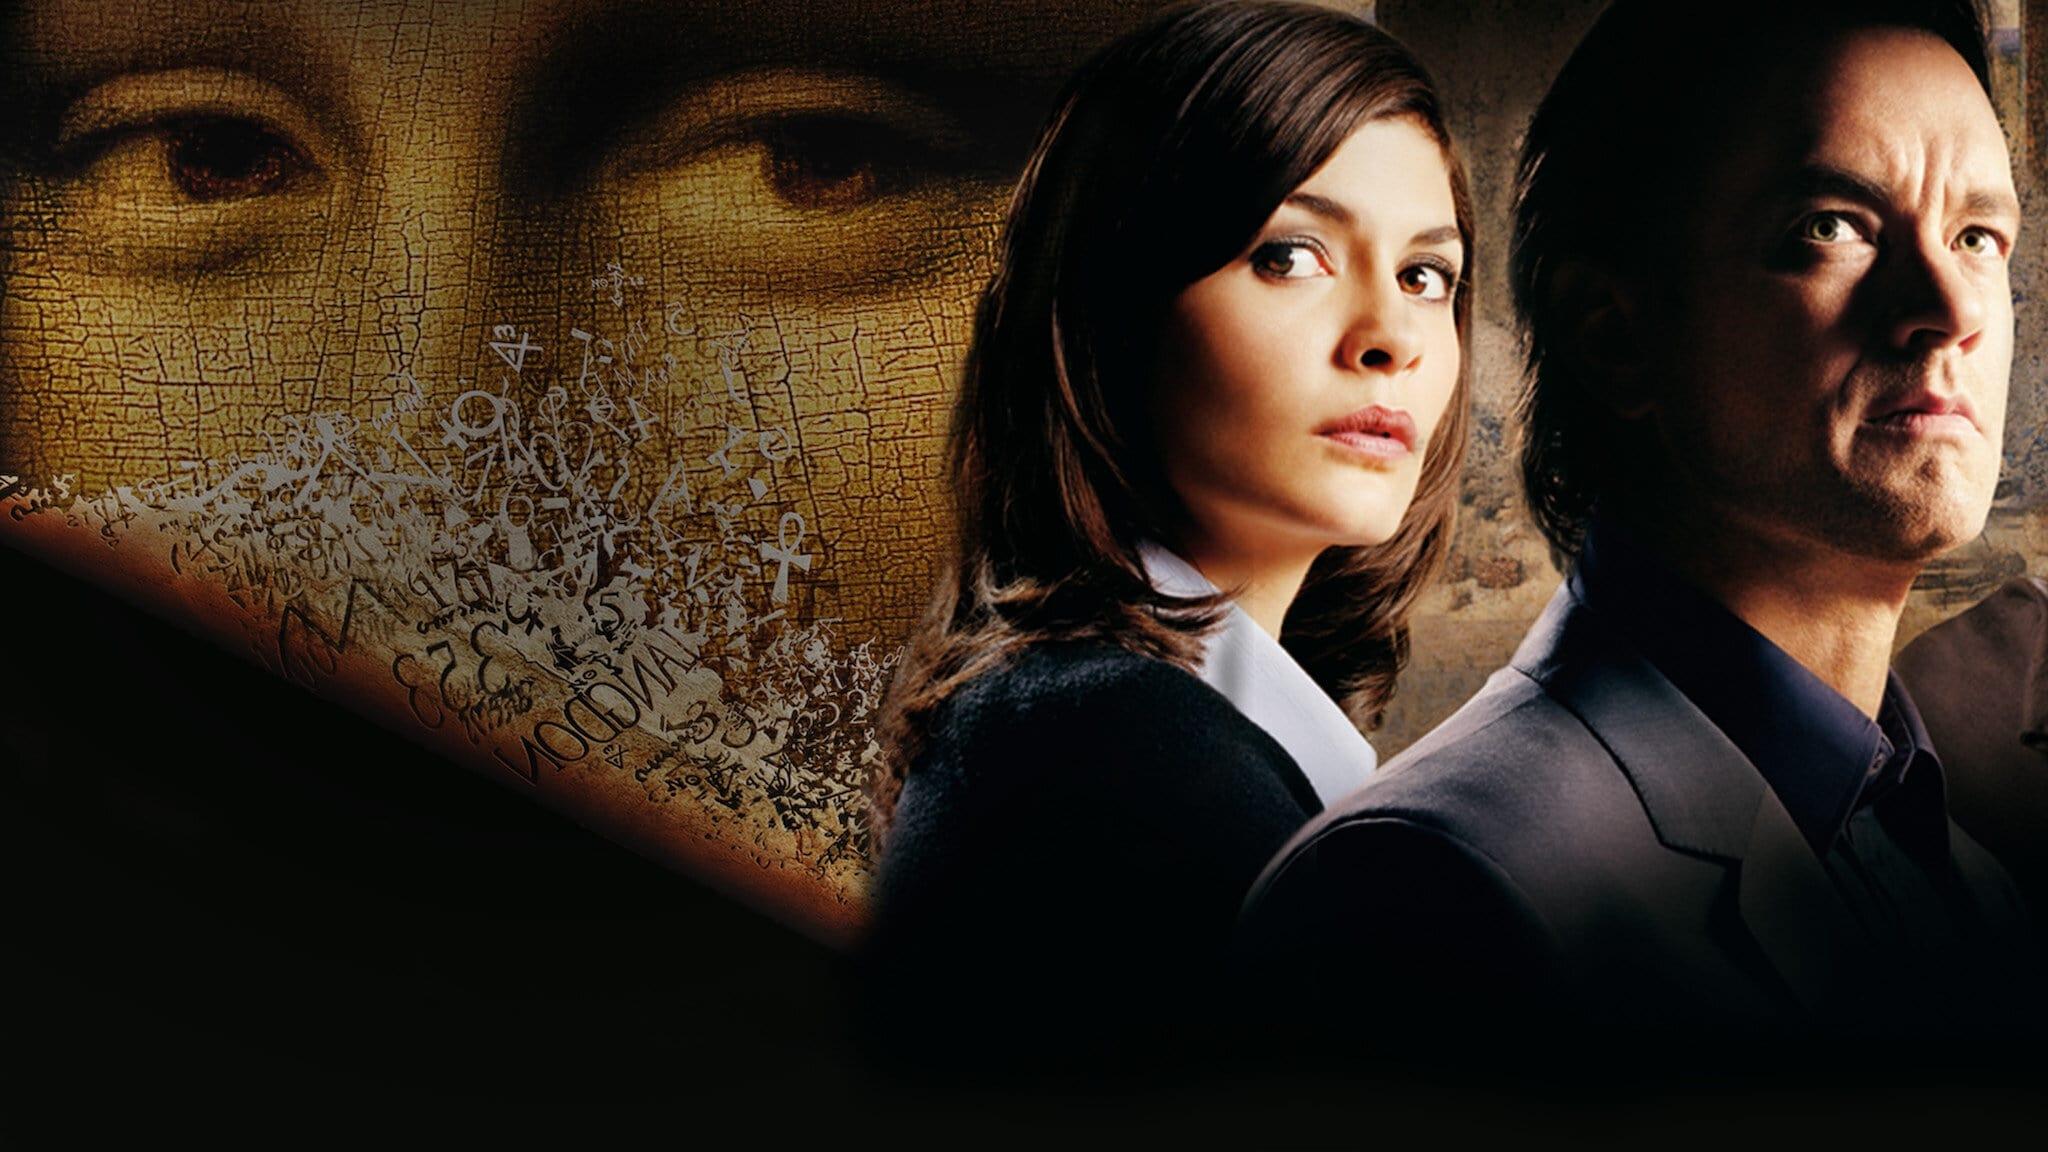 Da Vinci Code - Movie - Zone-Telechargement Streaming